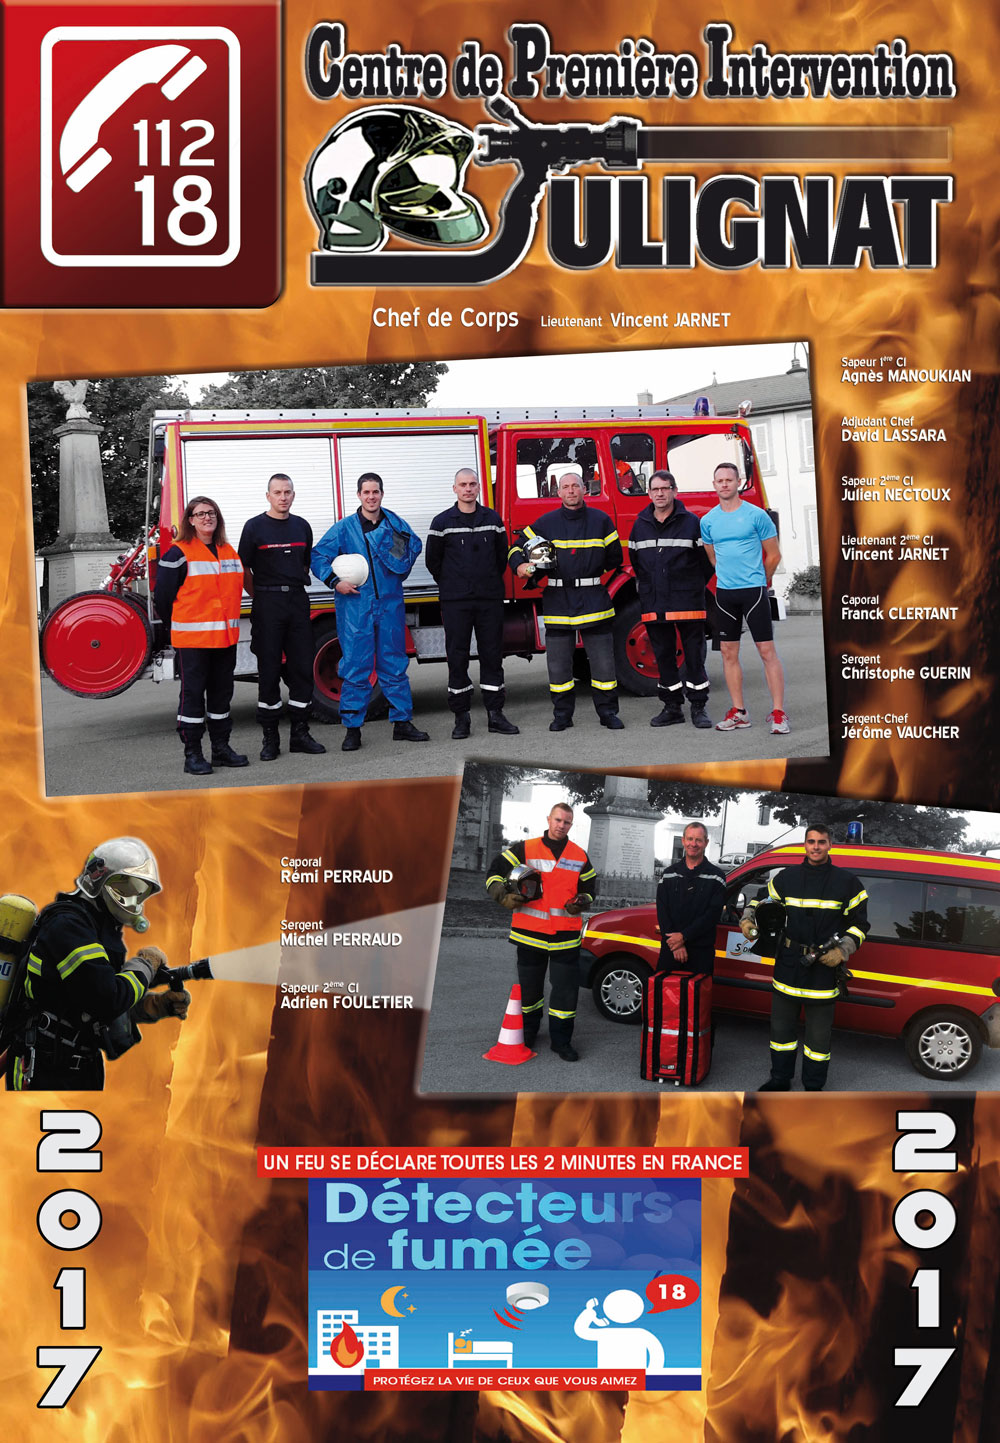 calendrier_pompier_sulignat